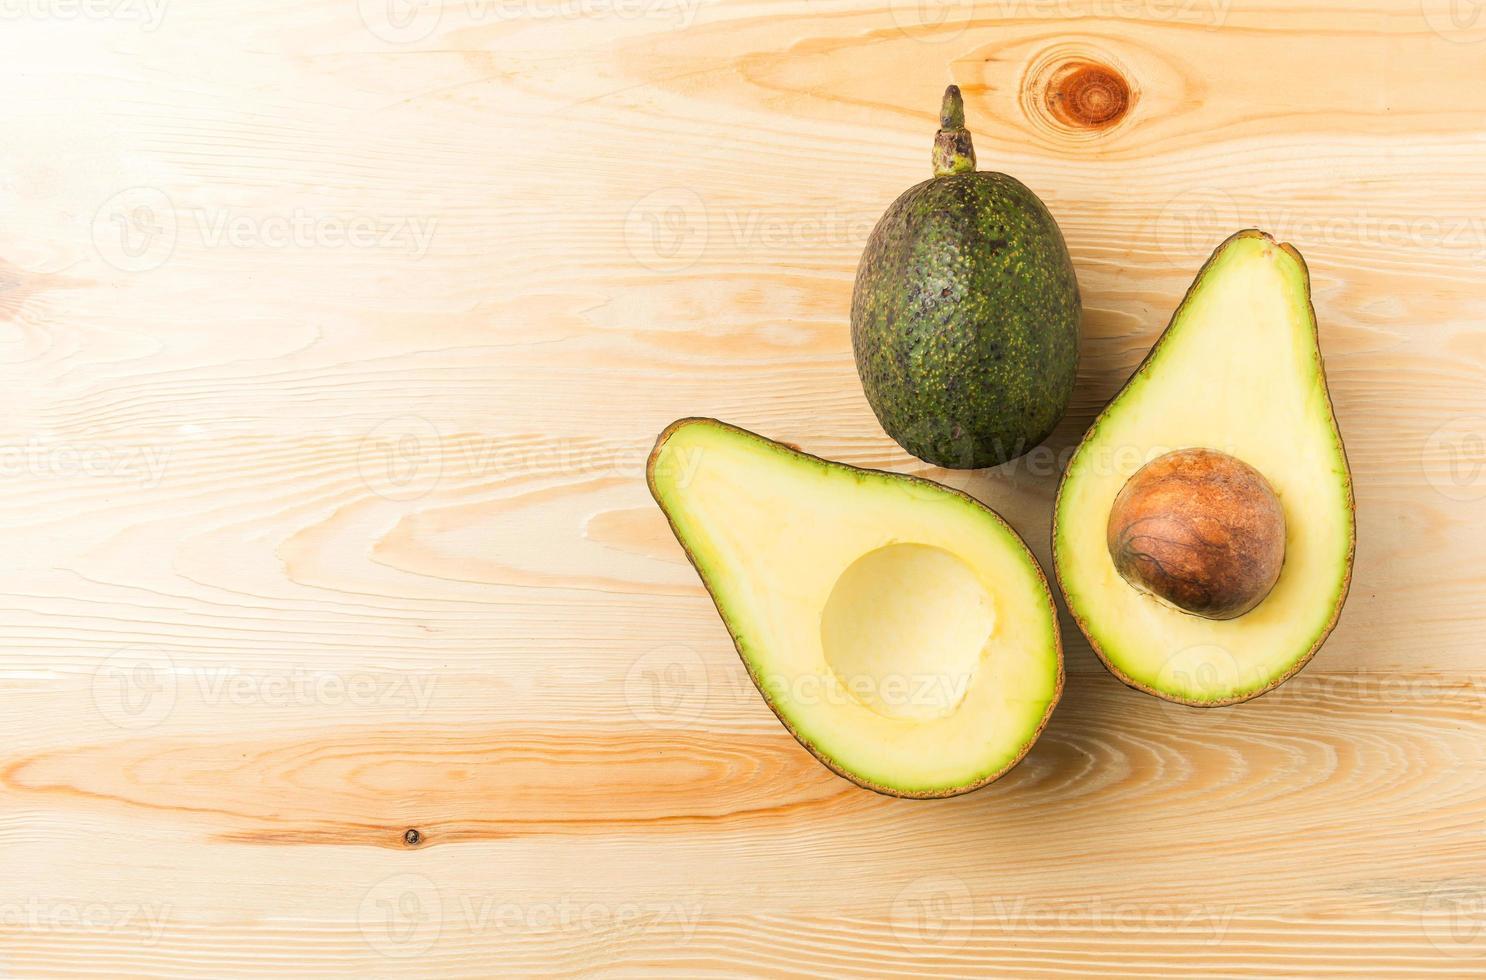 gesneden avocado op hout foto